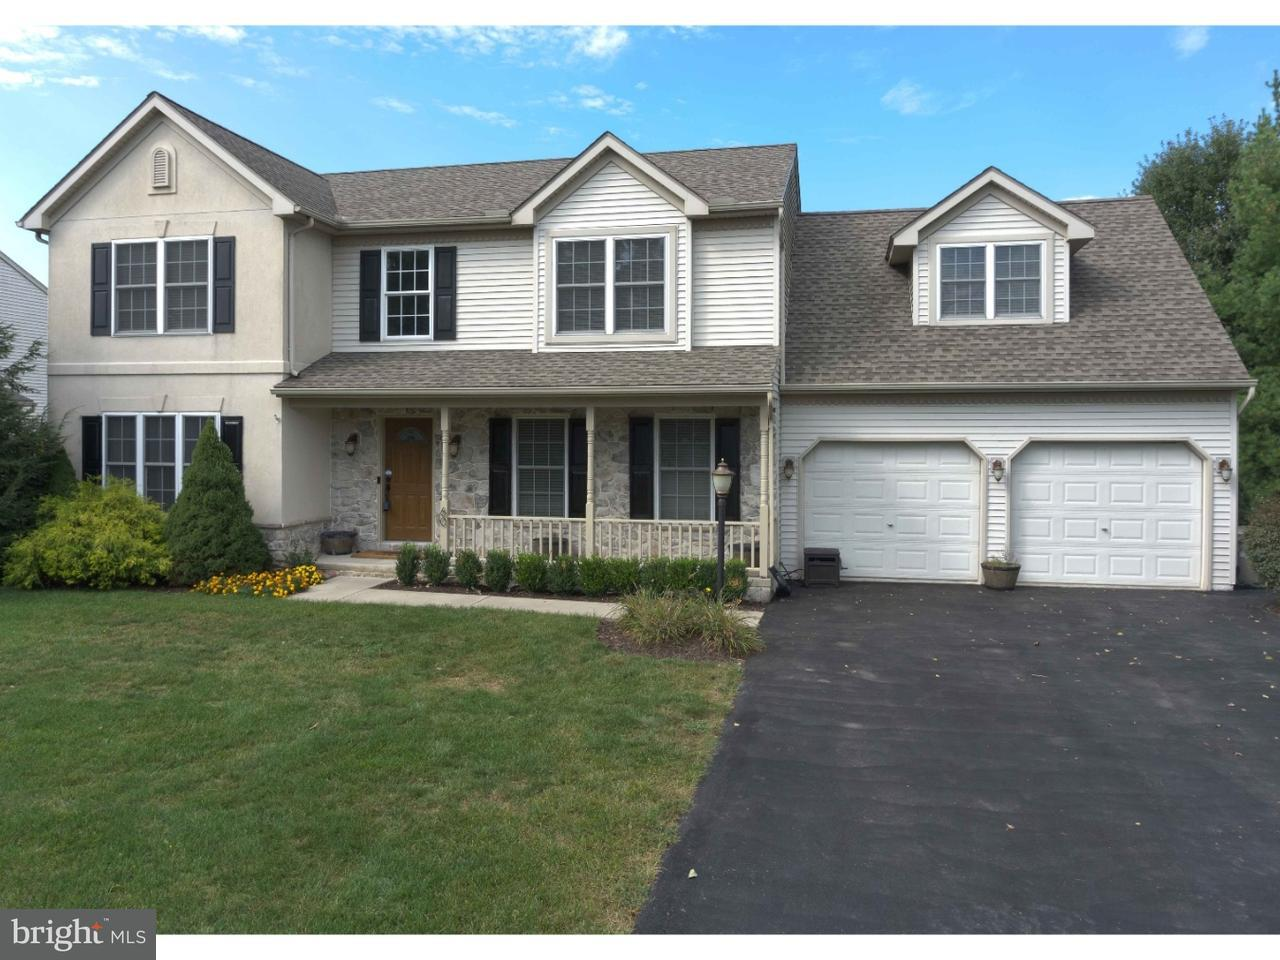 Single Family Home for Sale at 60 ROCK Road Ephrata, Pennsylvania 17522 United States